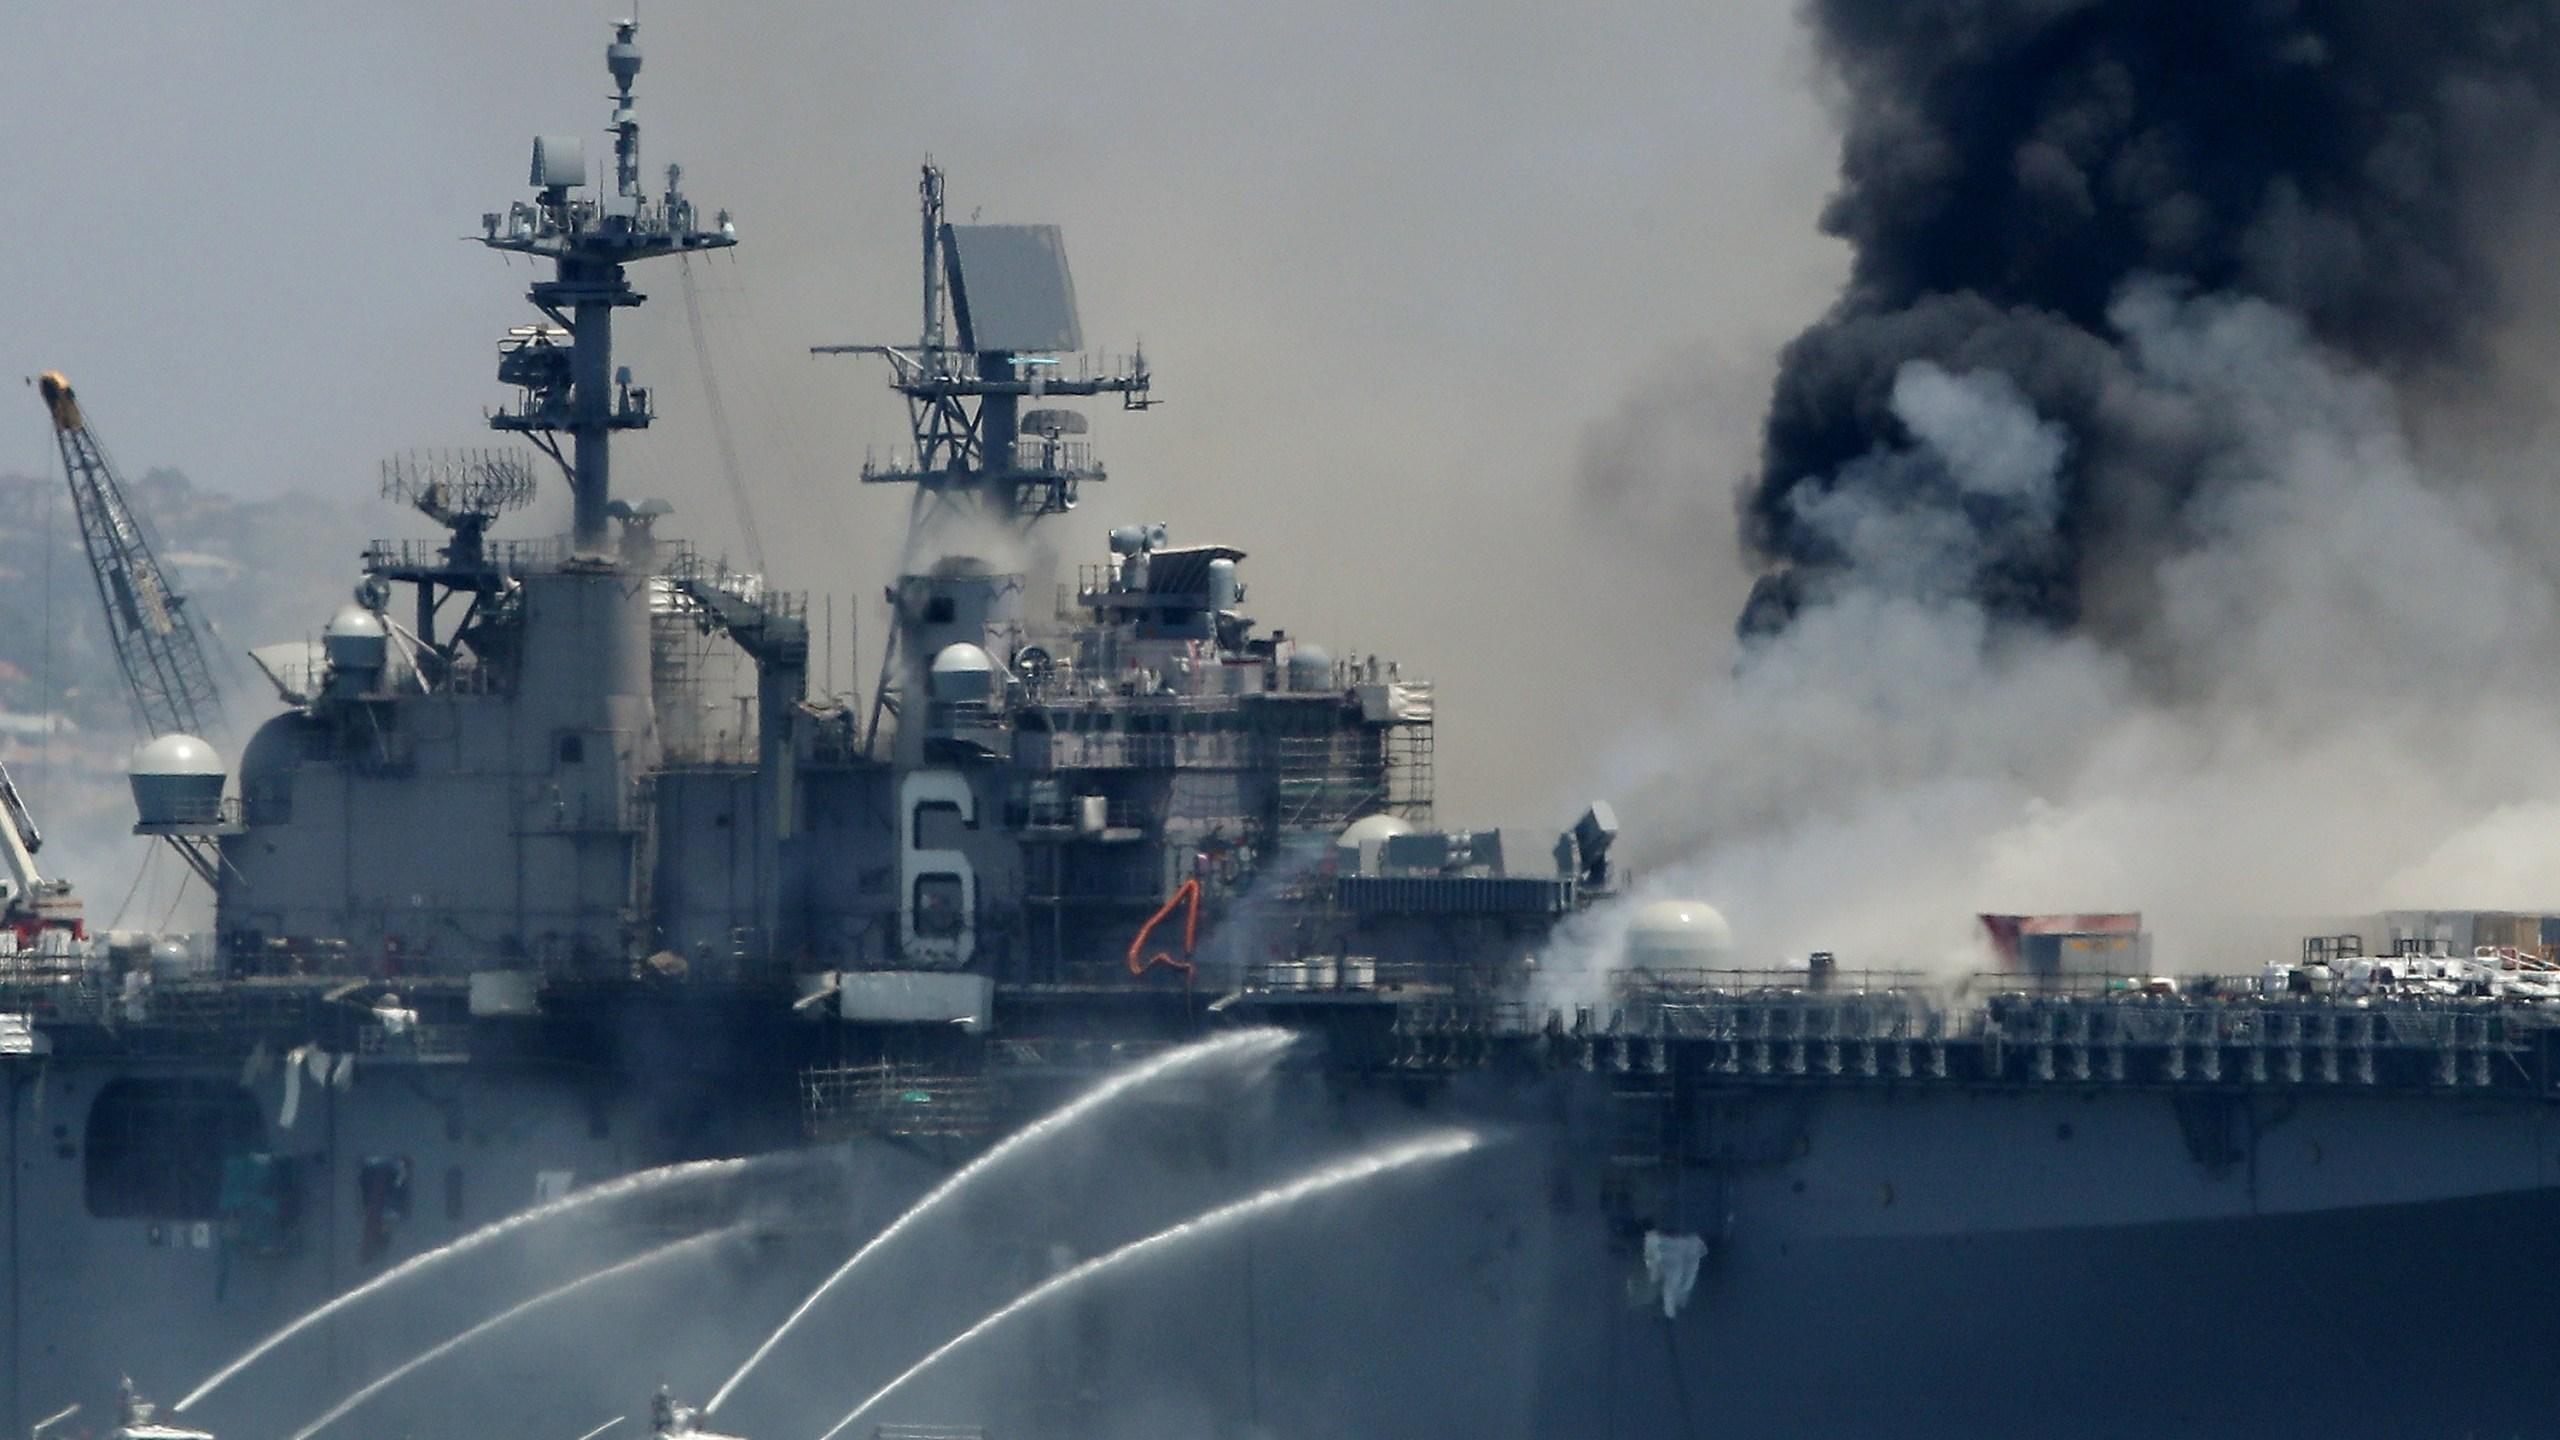 17 sailors, 4 civilians injured as crews battle fire at ...